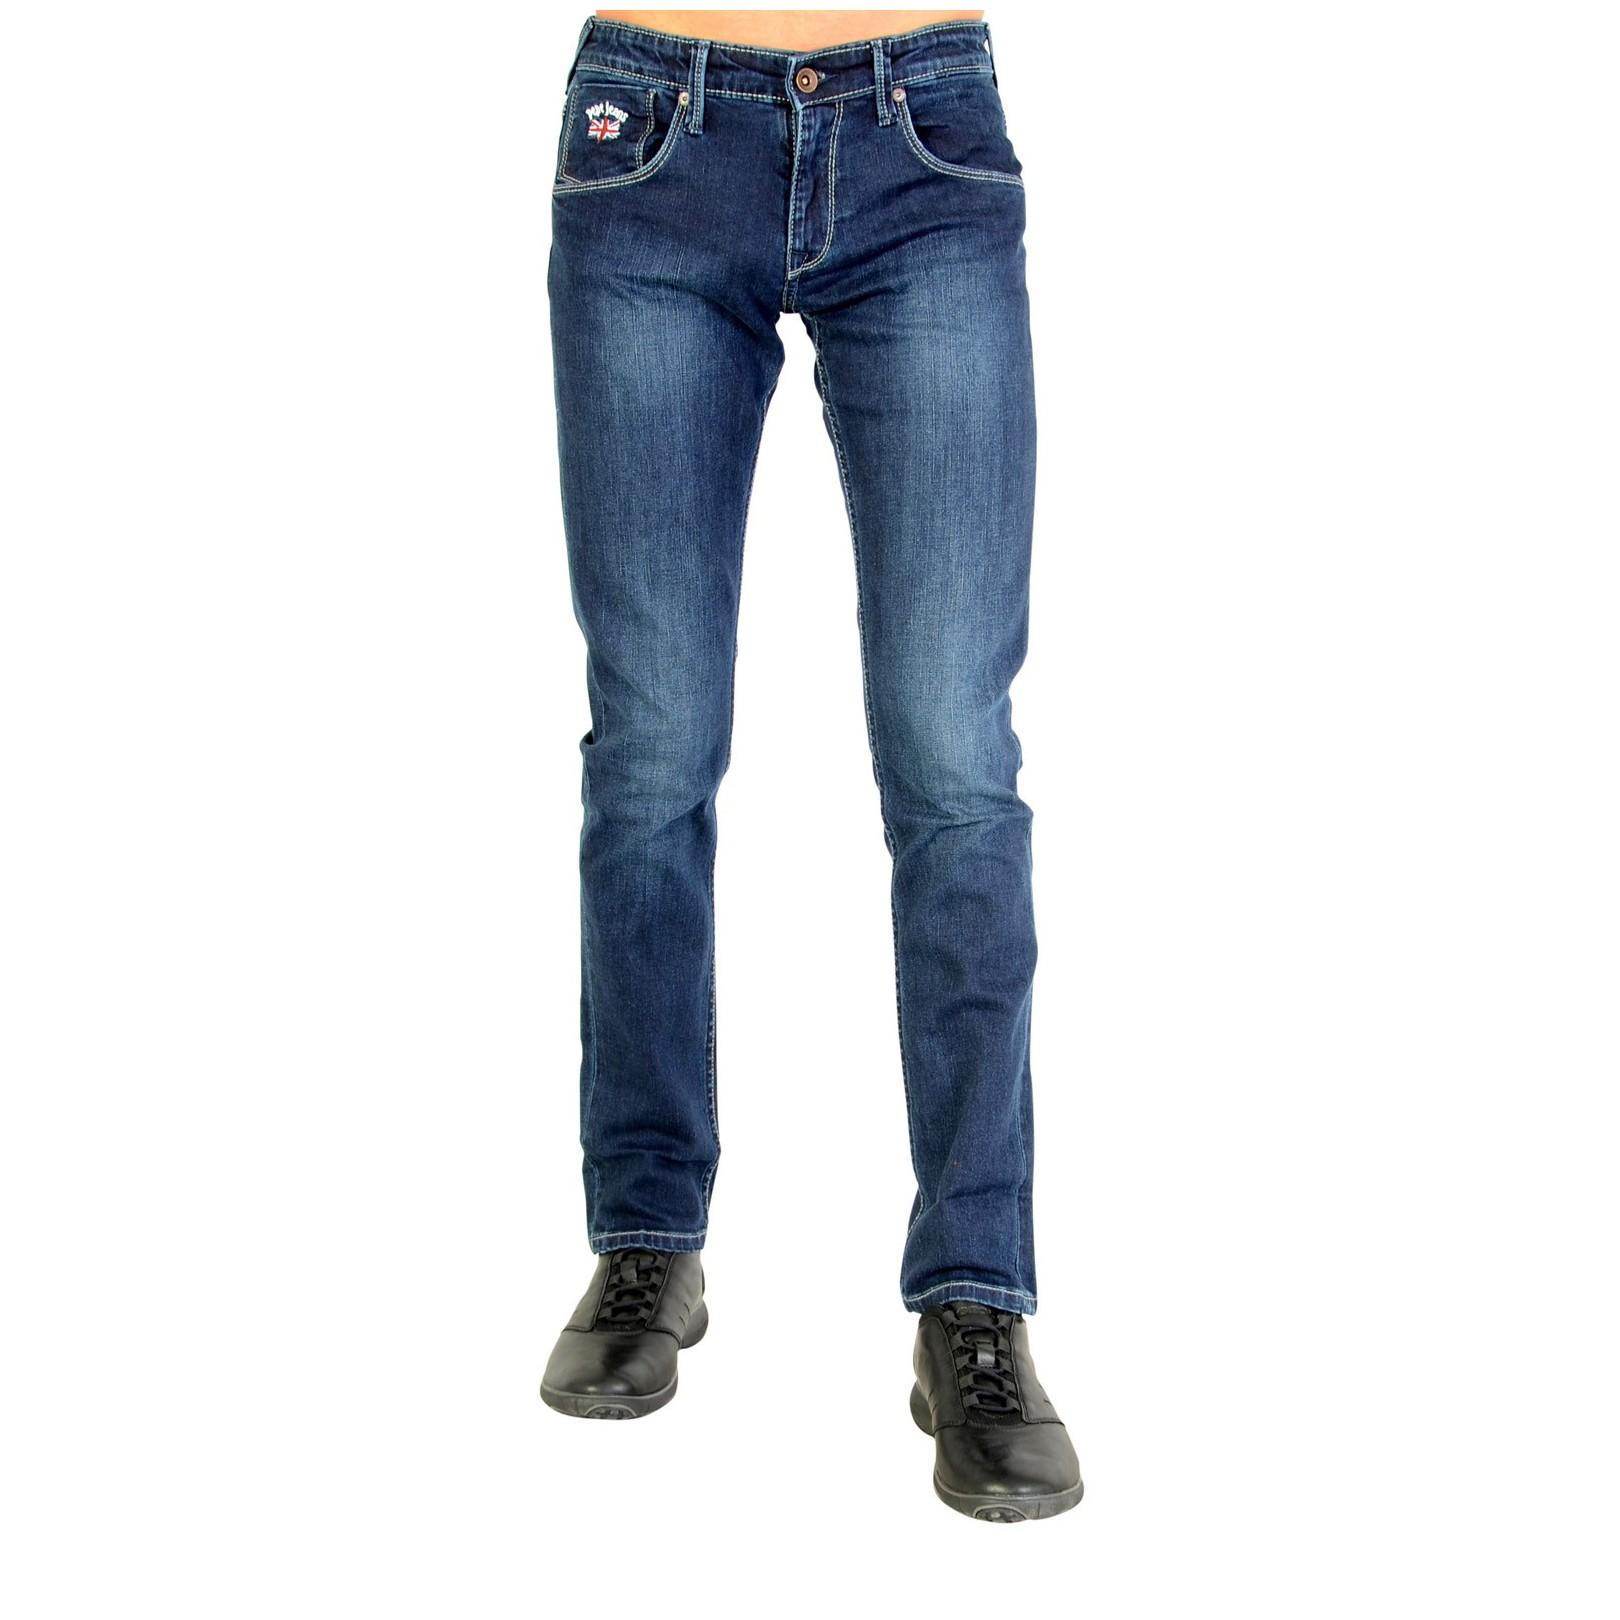 Jeans Pepe Jeans PB200491p46 Jamison